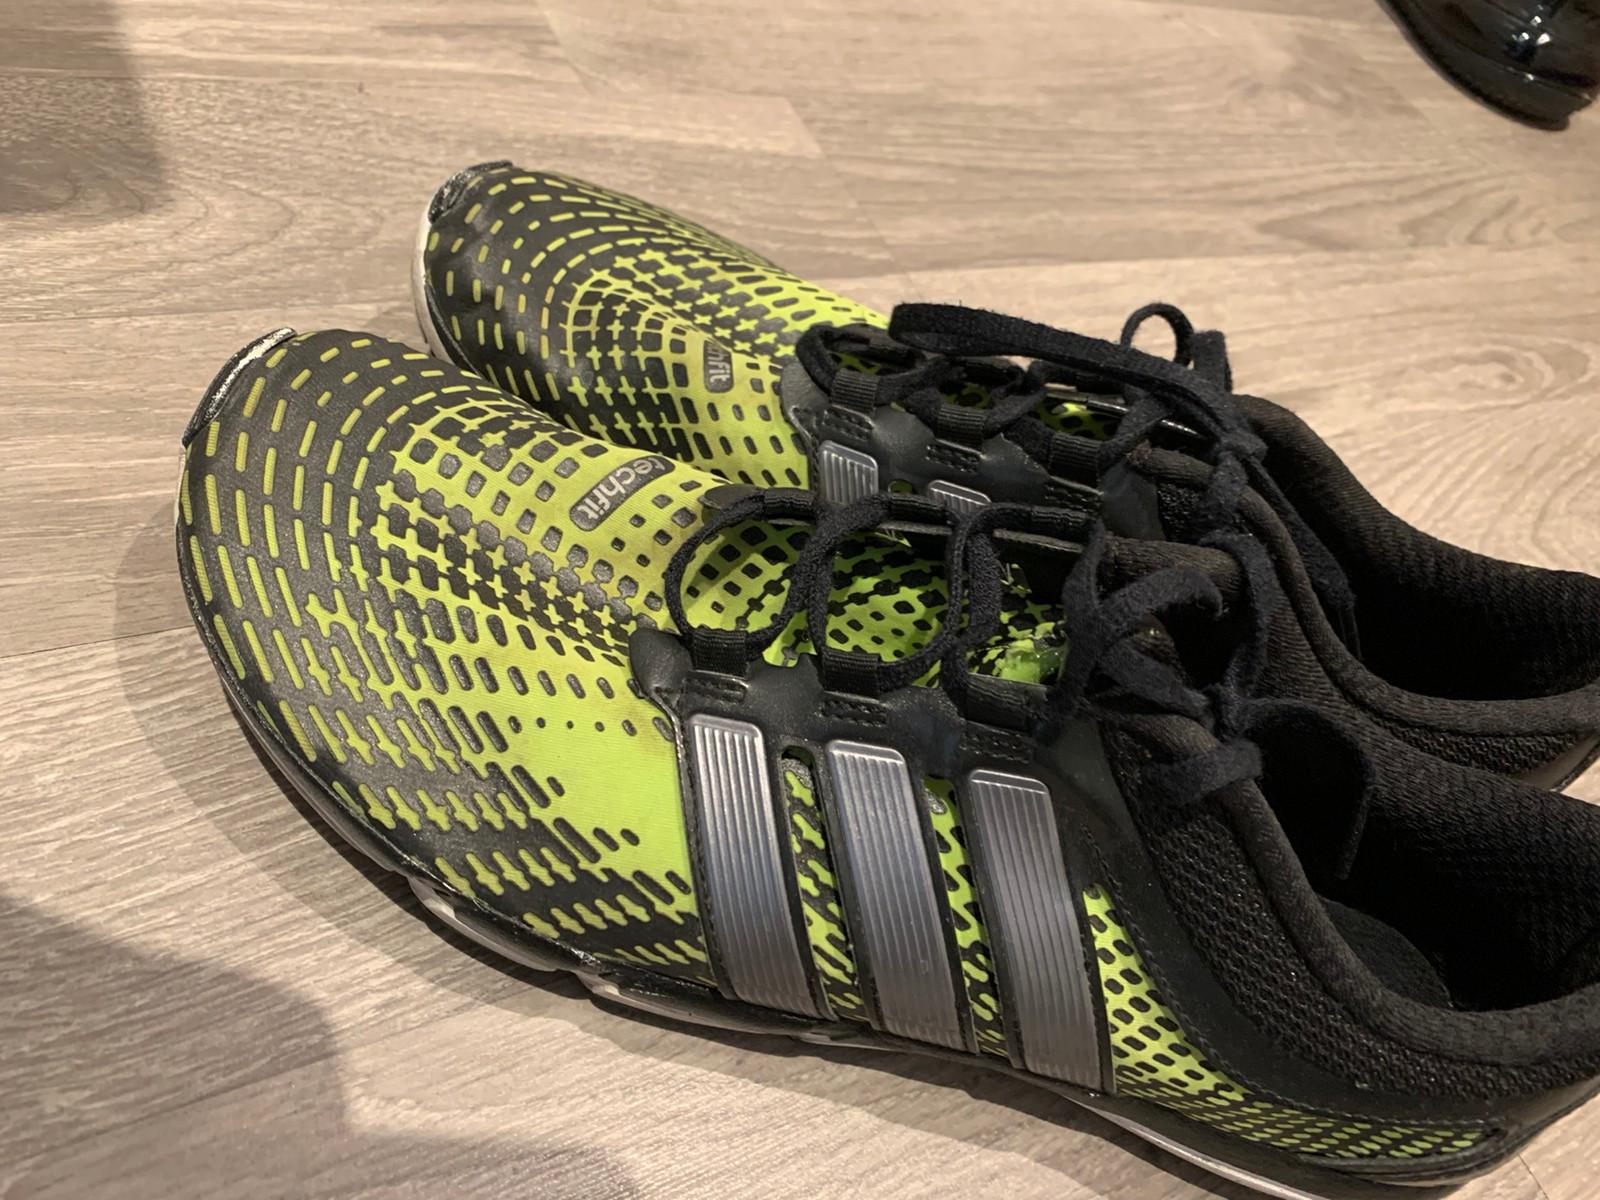 Joggesko Adidas herre str 46 13   FINN.no